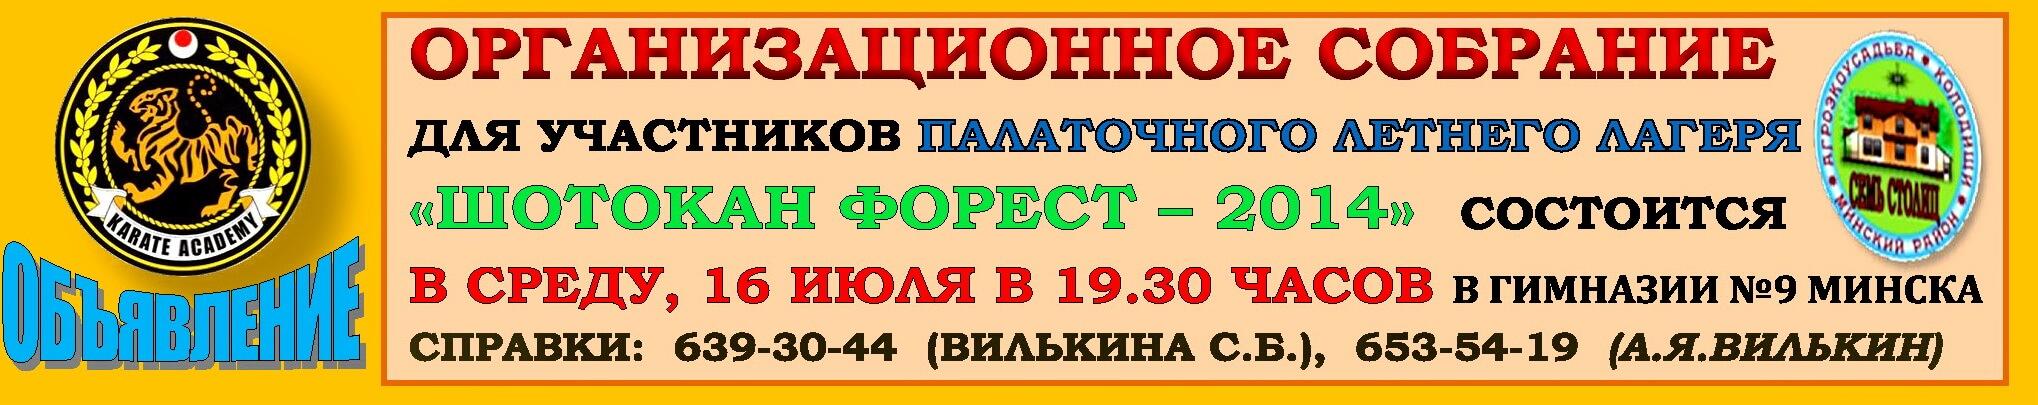 АК Собрание 2014-07-16